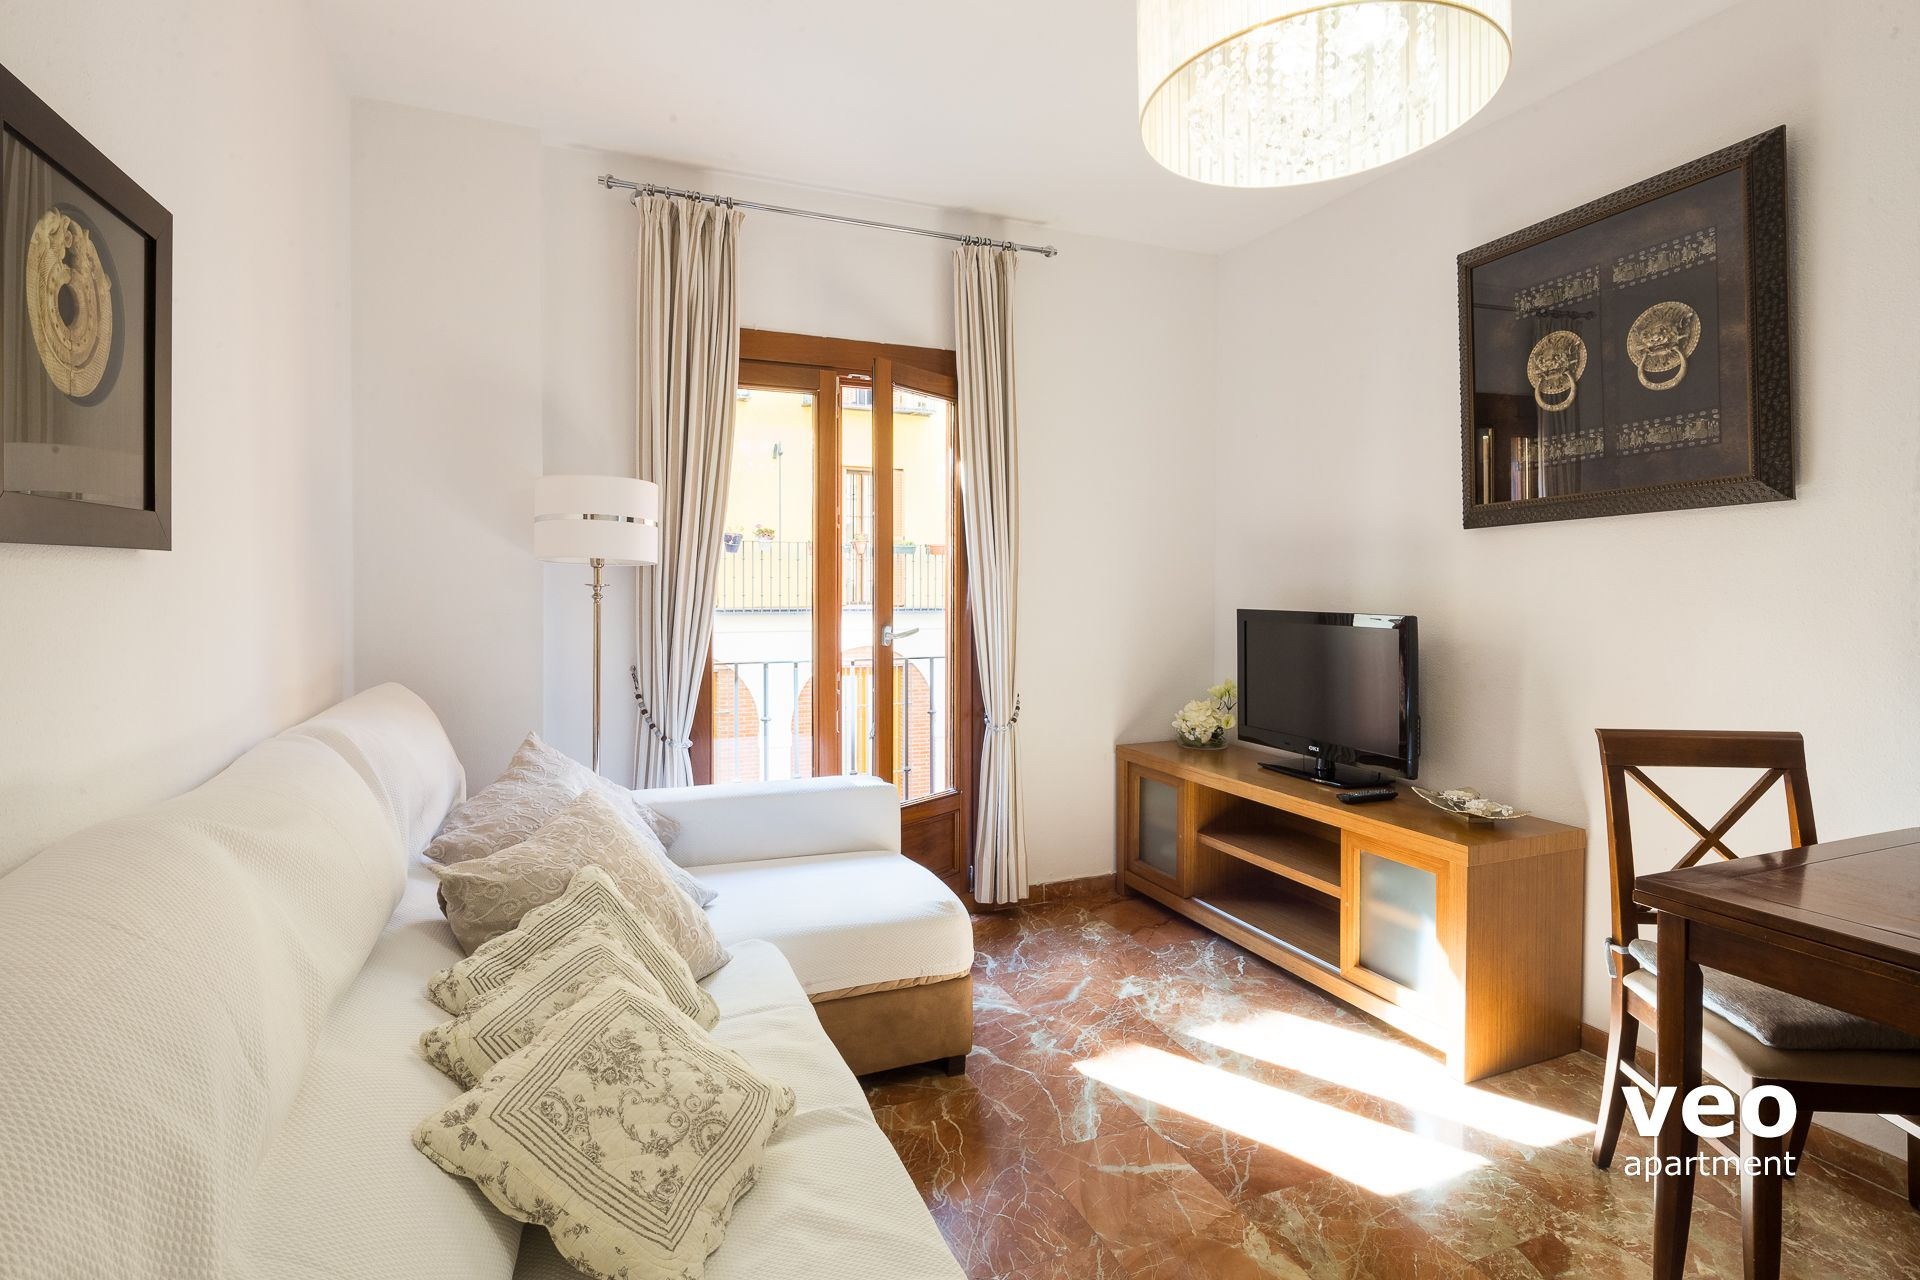 Apartment Mieten Ximenez De Enciso Strasse Sevilla Spanien Santa Cruz Ferienwohnung In Sevilla